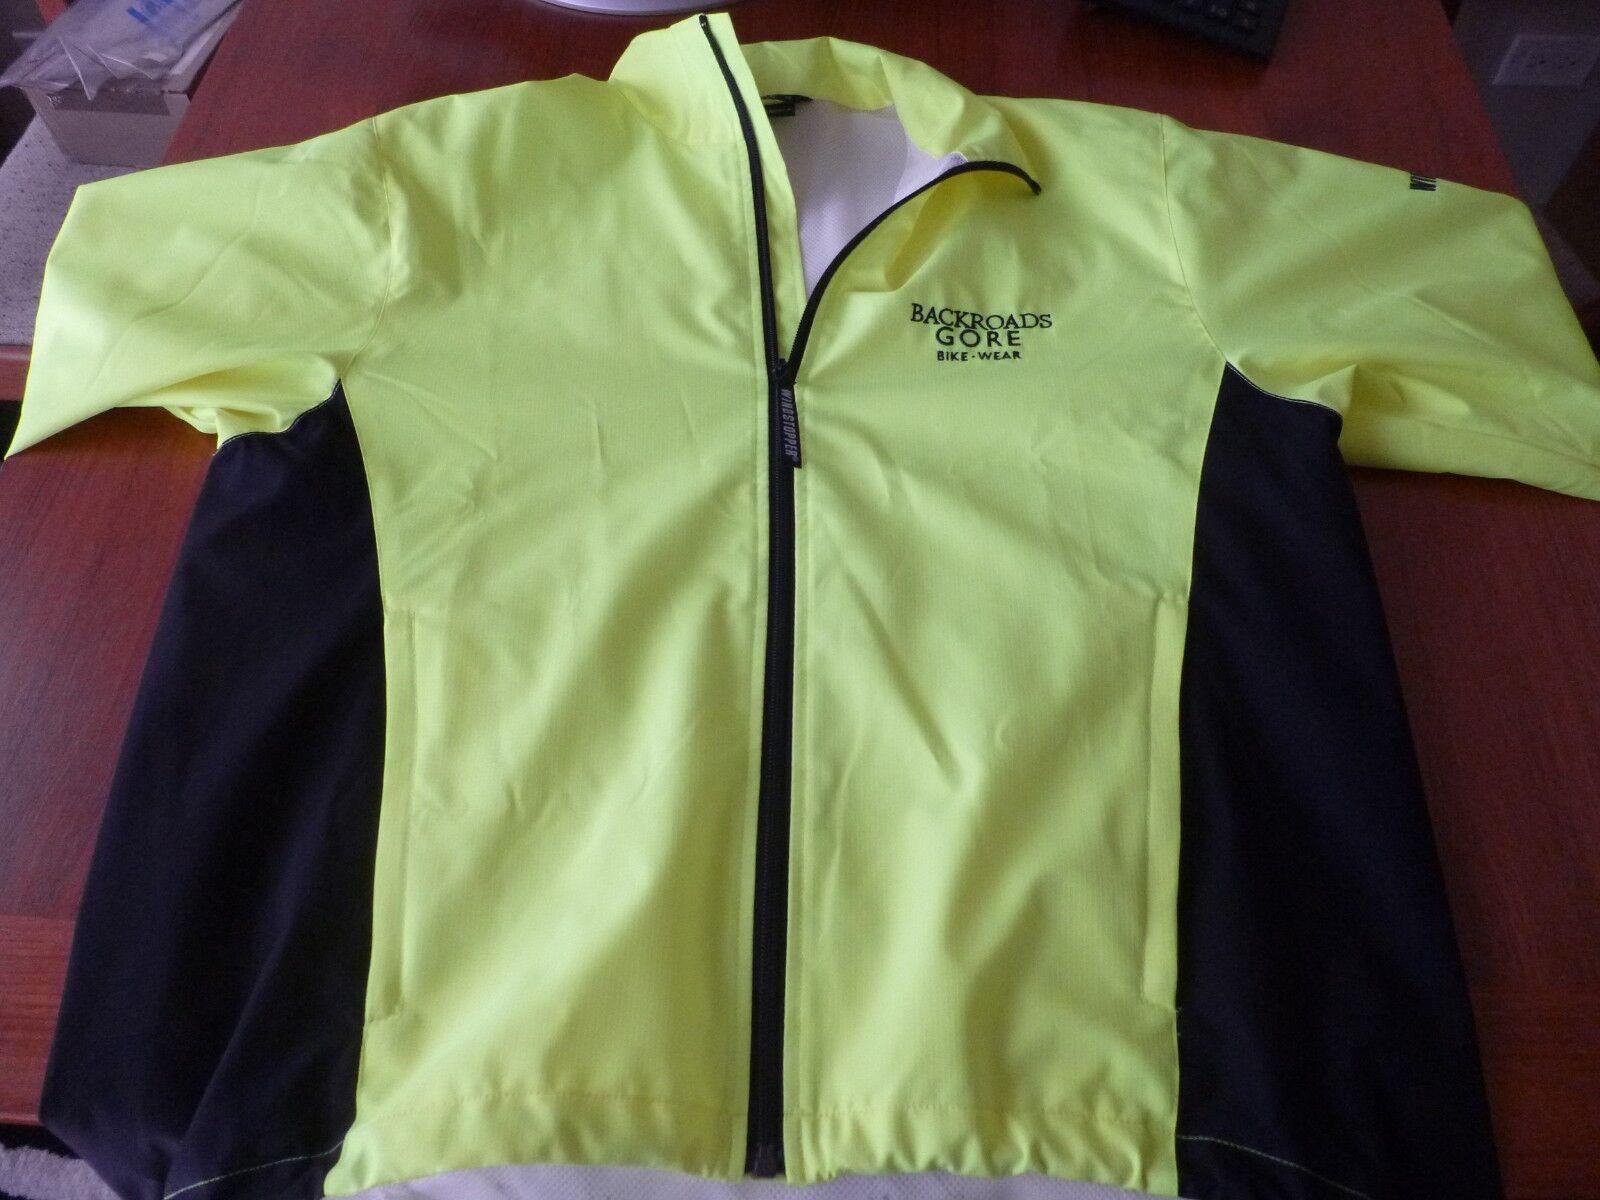 Gore Bike  Wear windstopped Para Hombre Chaqueta Ciclismo Soft Shell Medio Amarillo Neón  100% a estrenar con calidad original.